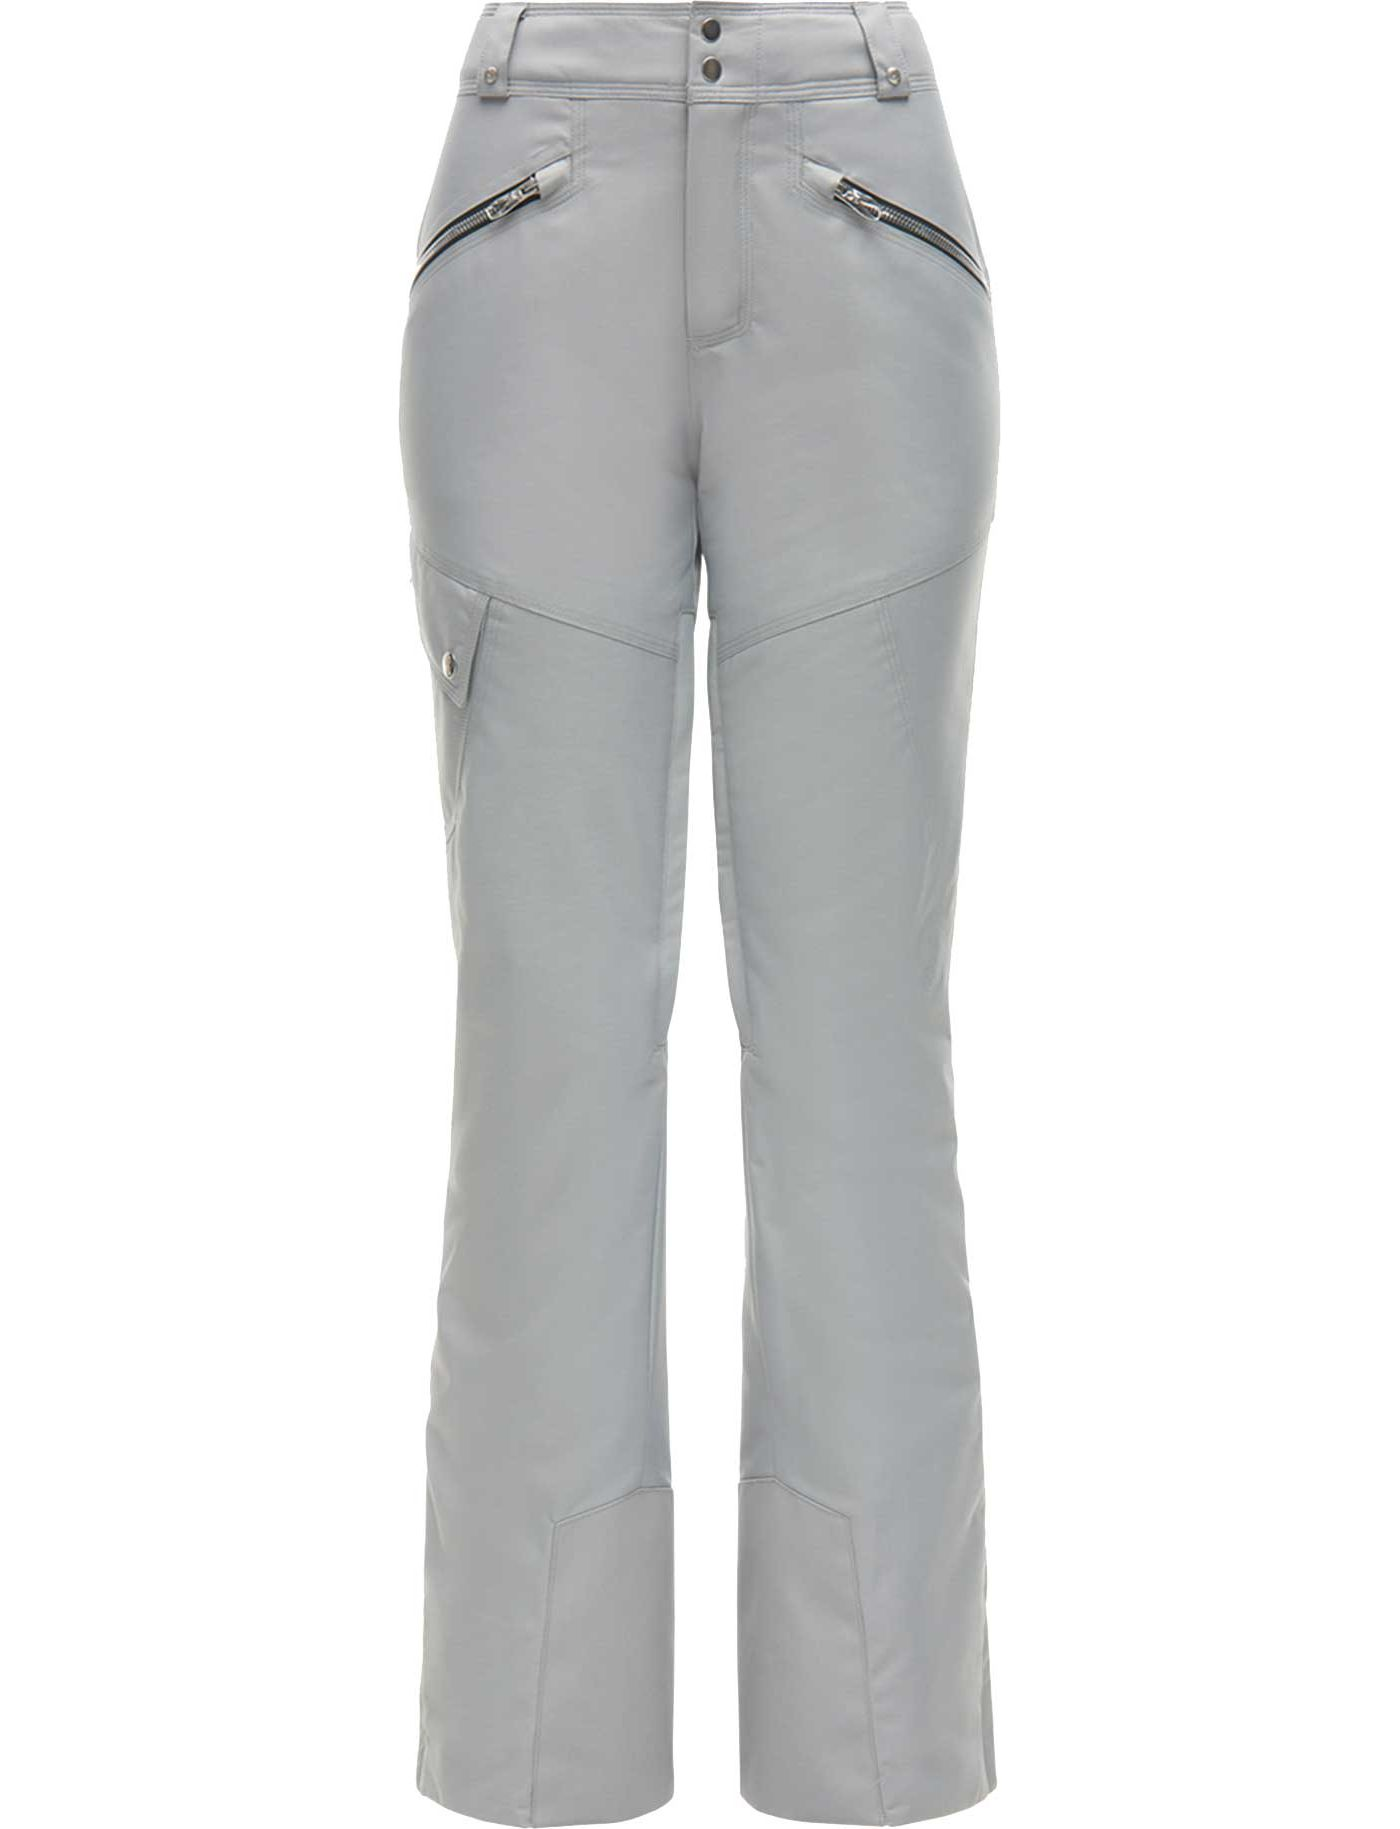 Spyder Women's Me Pants